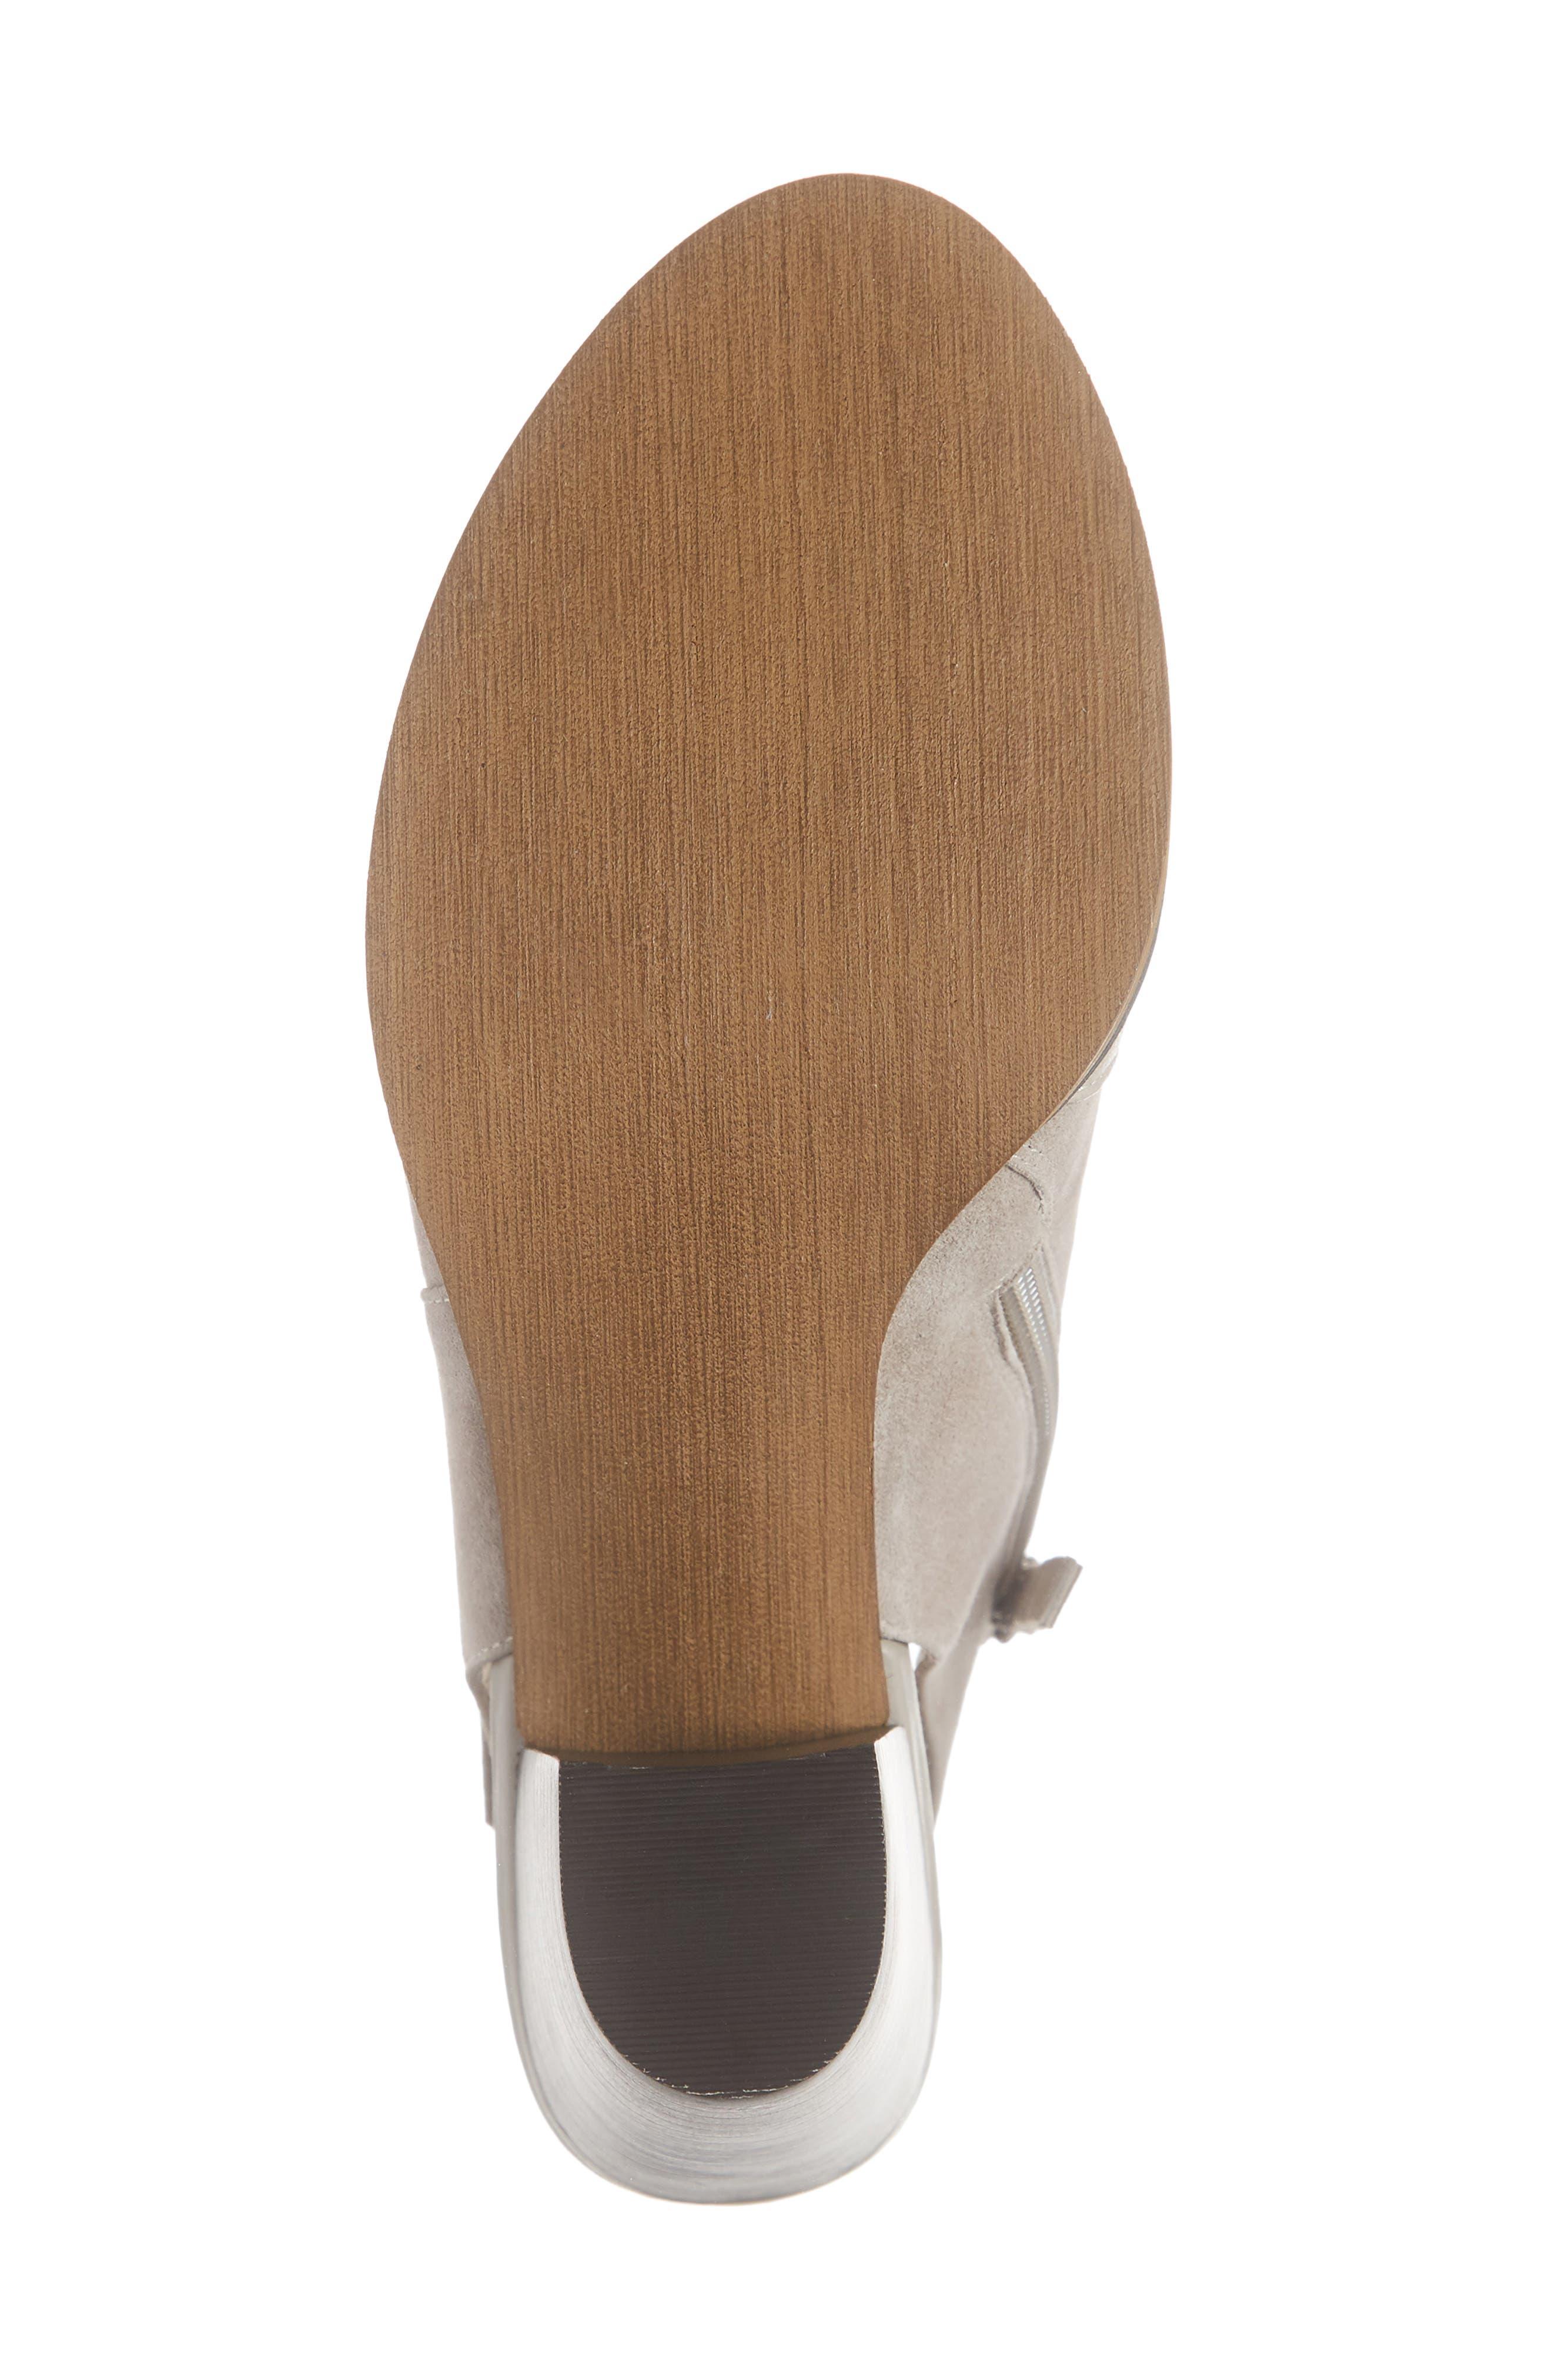 BELLA VITA, Kellan Mixed Finish Sandal, Alternate thumbnail 6, color, STONE LEATHER/ SUEDE